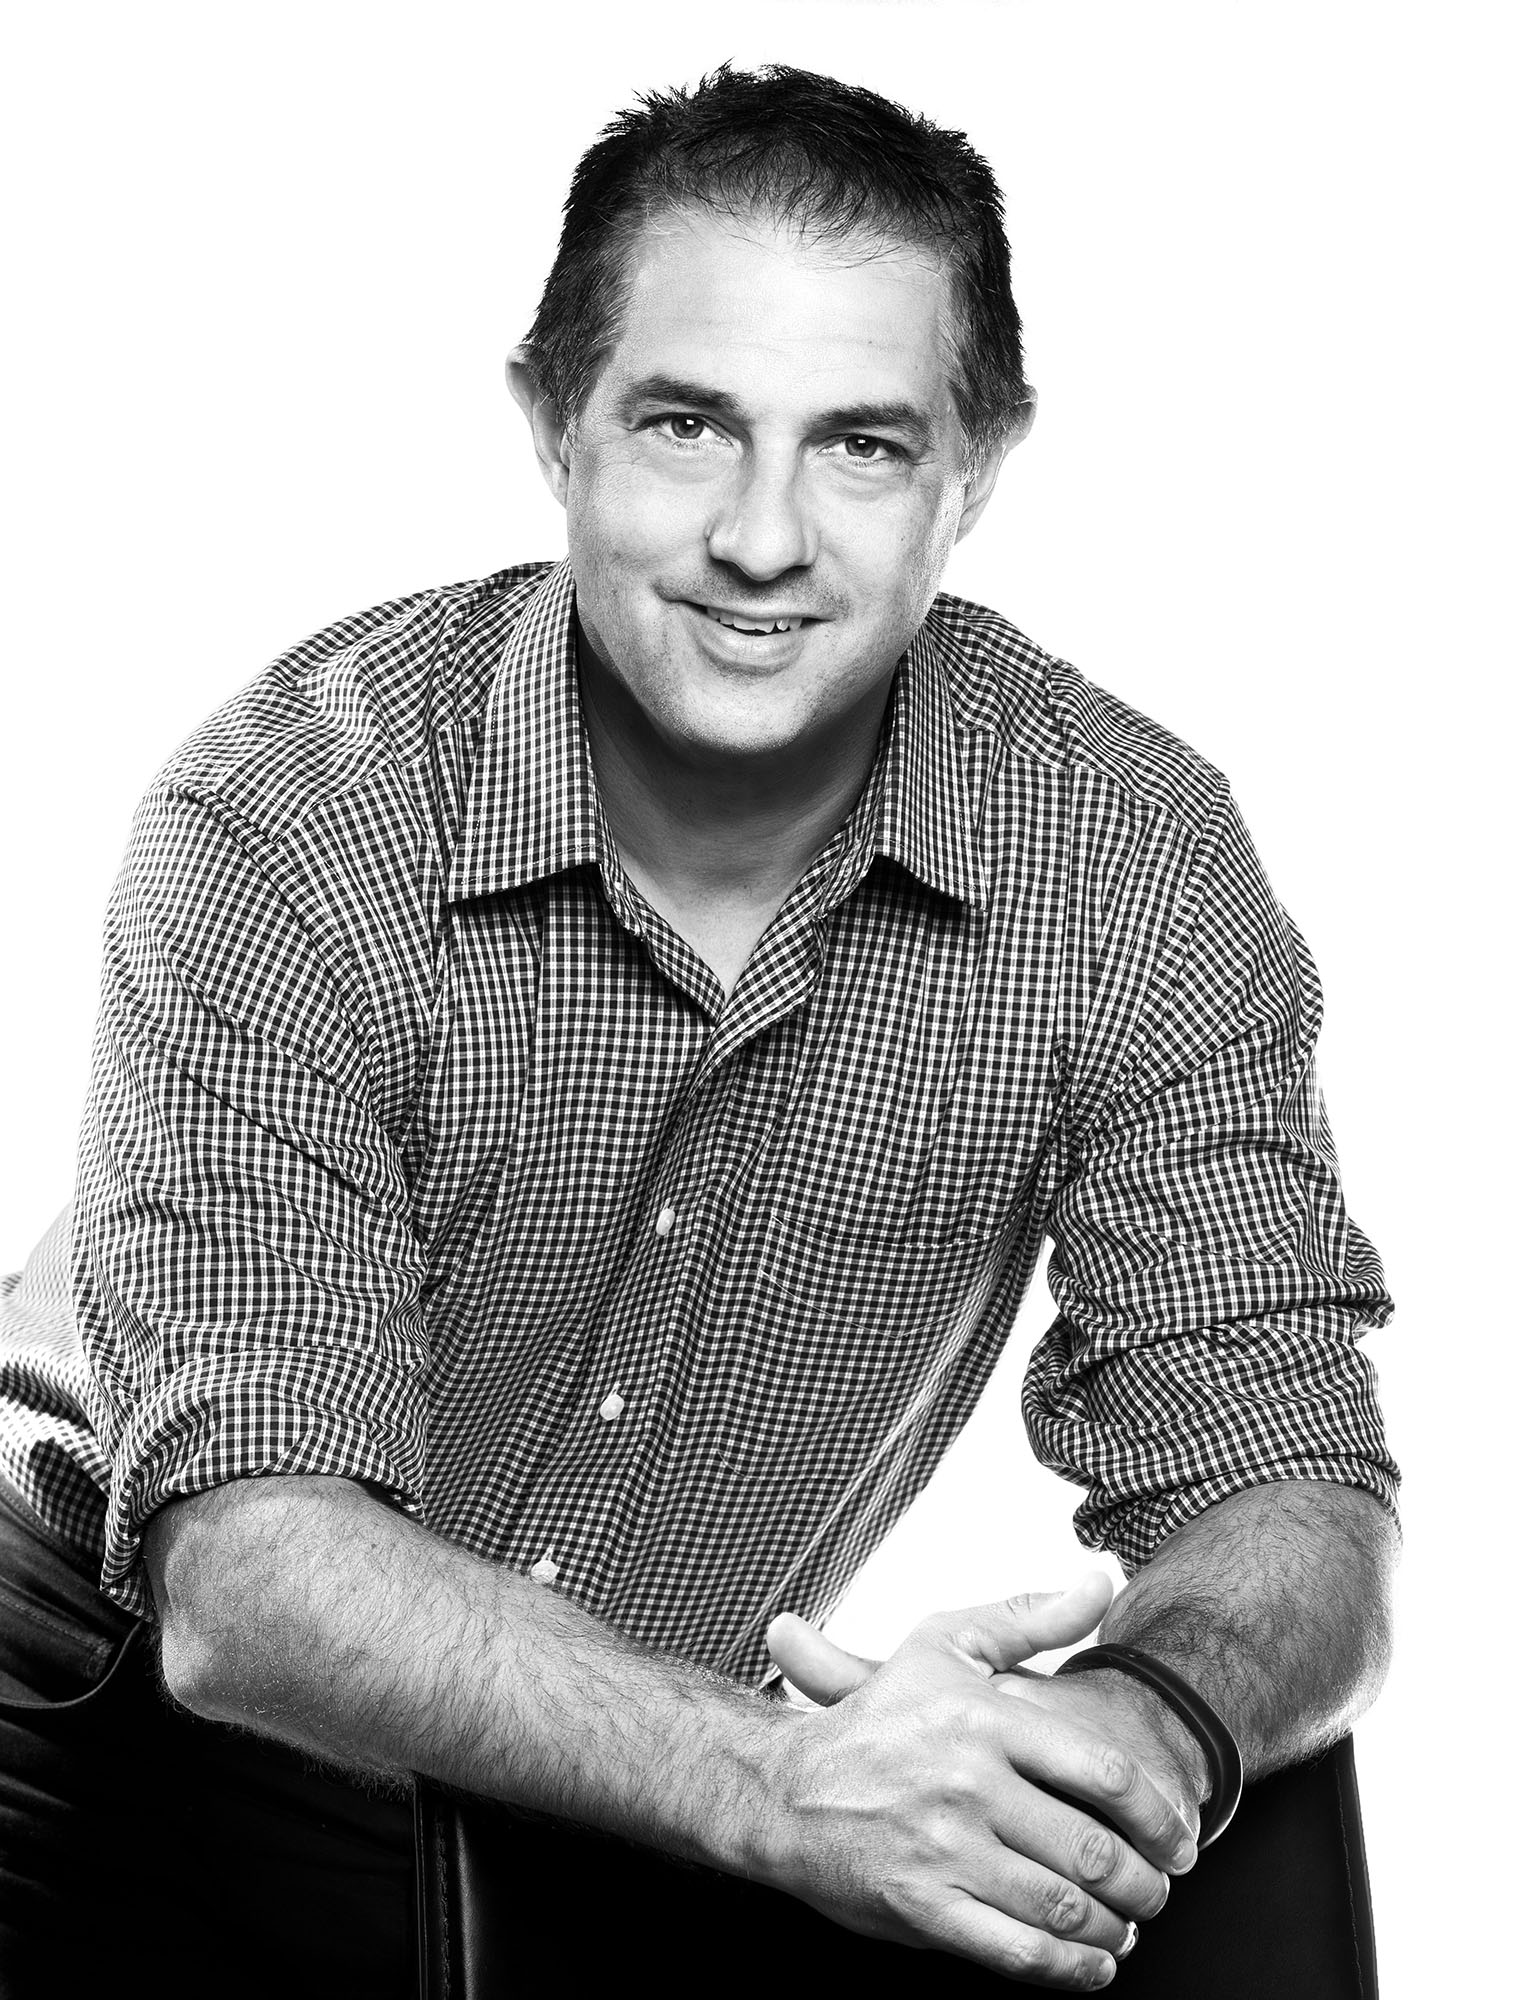 Randall Peg Peters